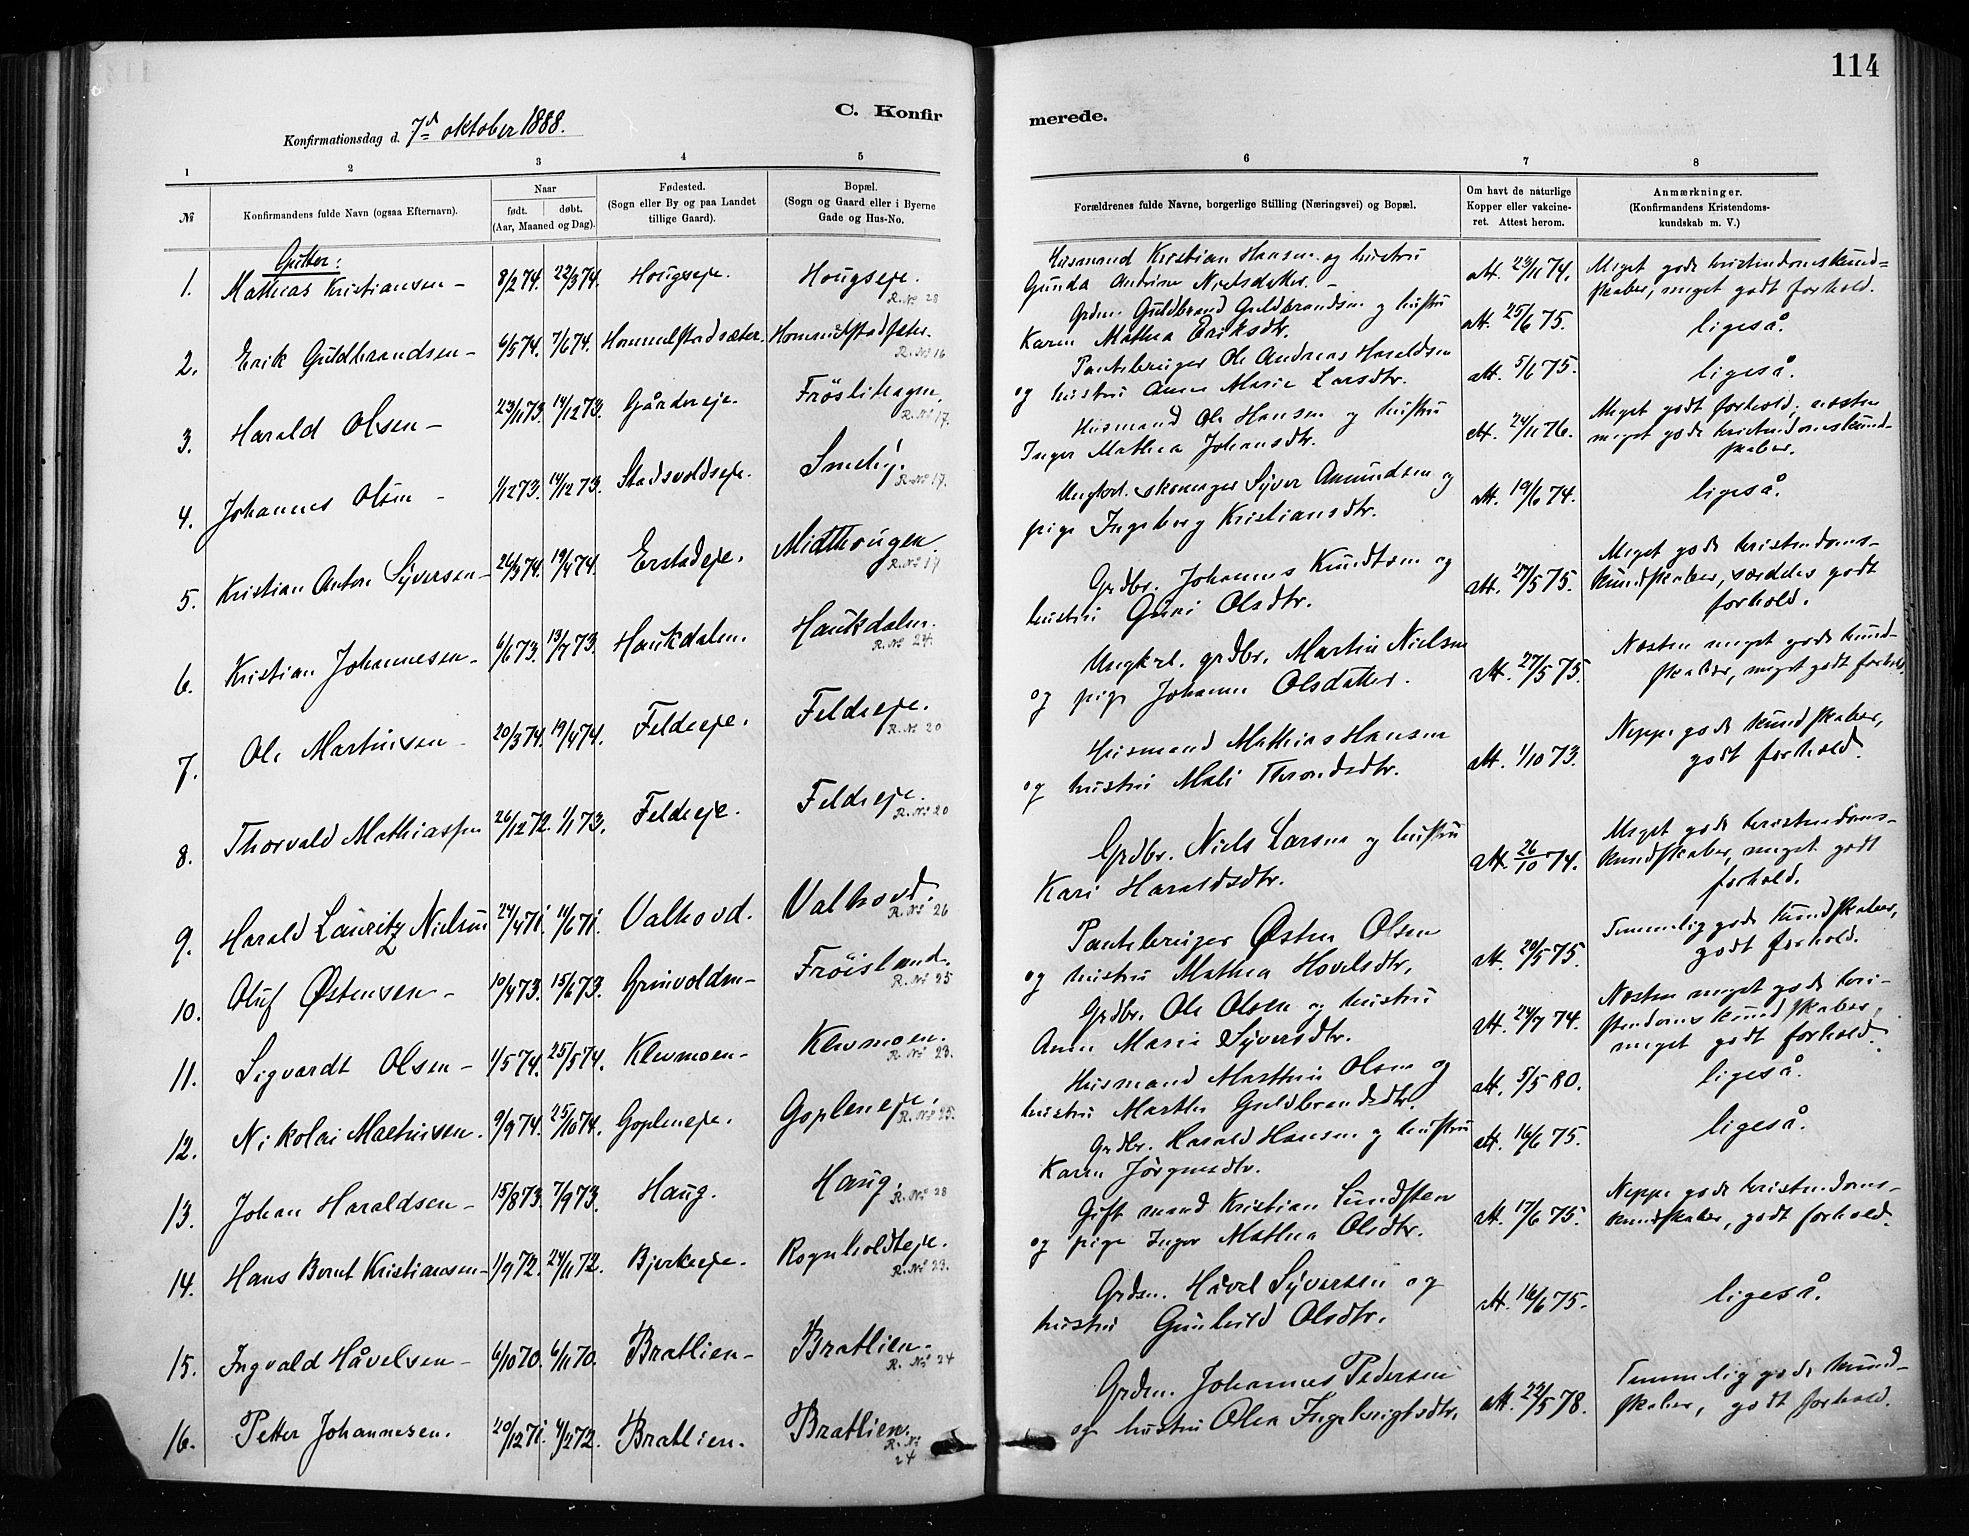 SAH, Nordre Land prestekontor, Ministerialbok nr. 4, 1882-1896, s. 114